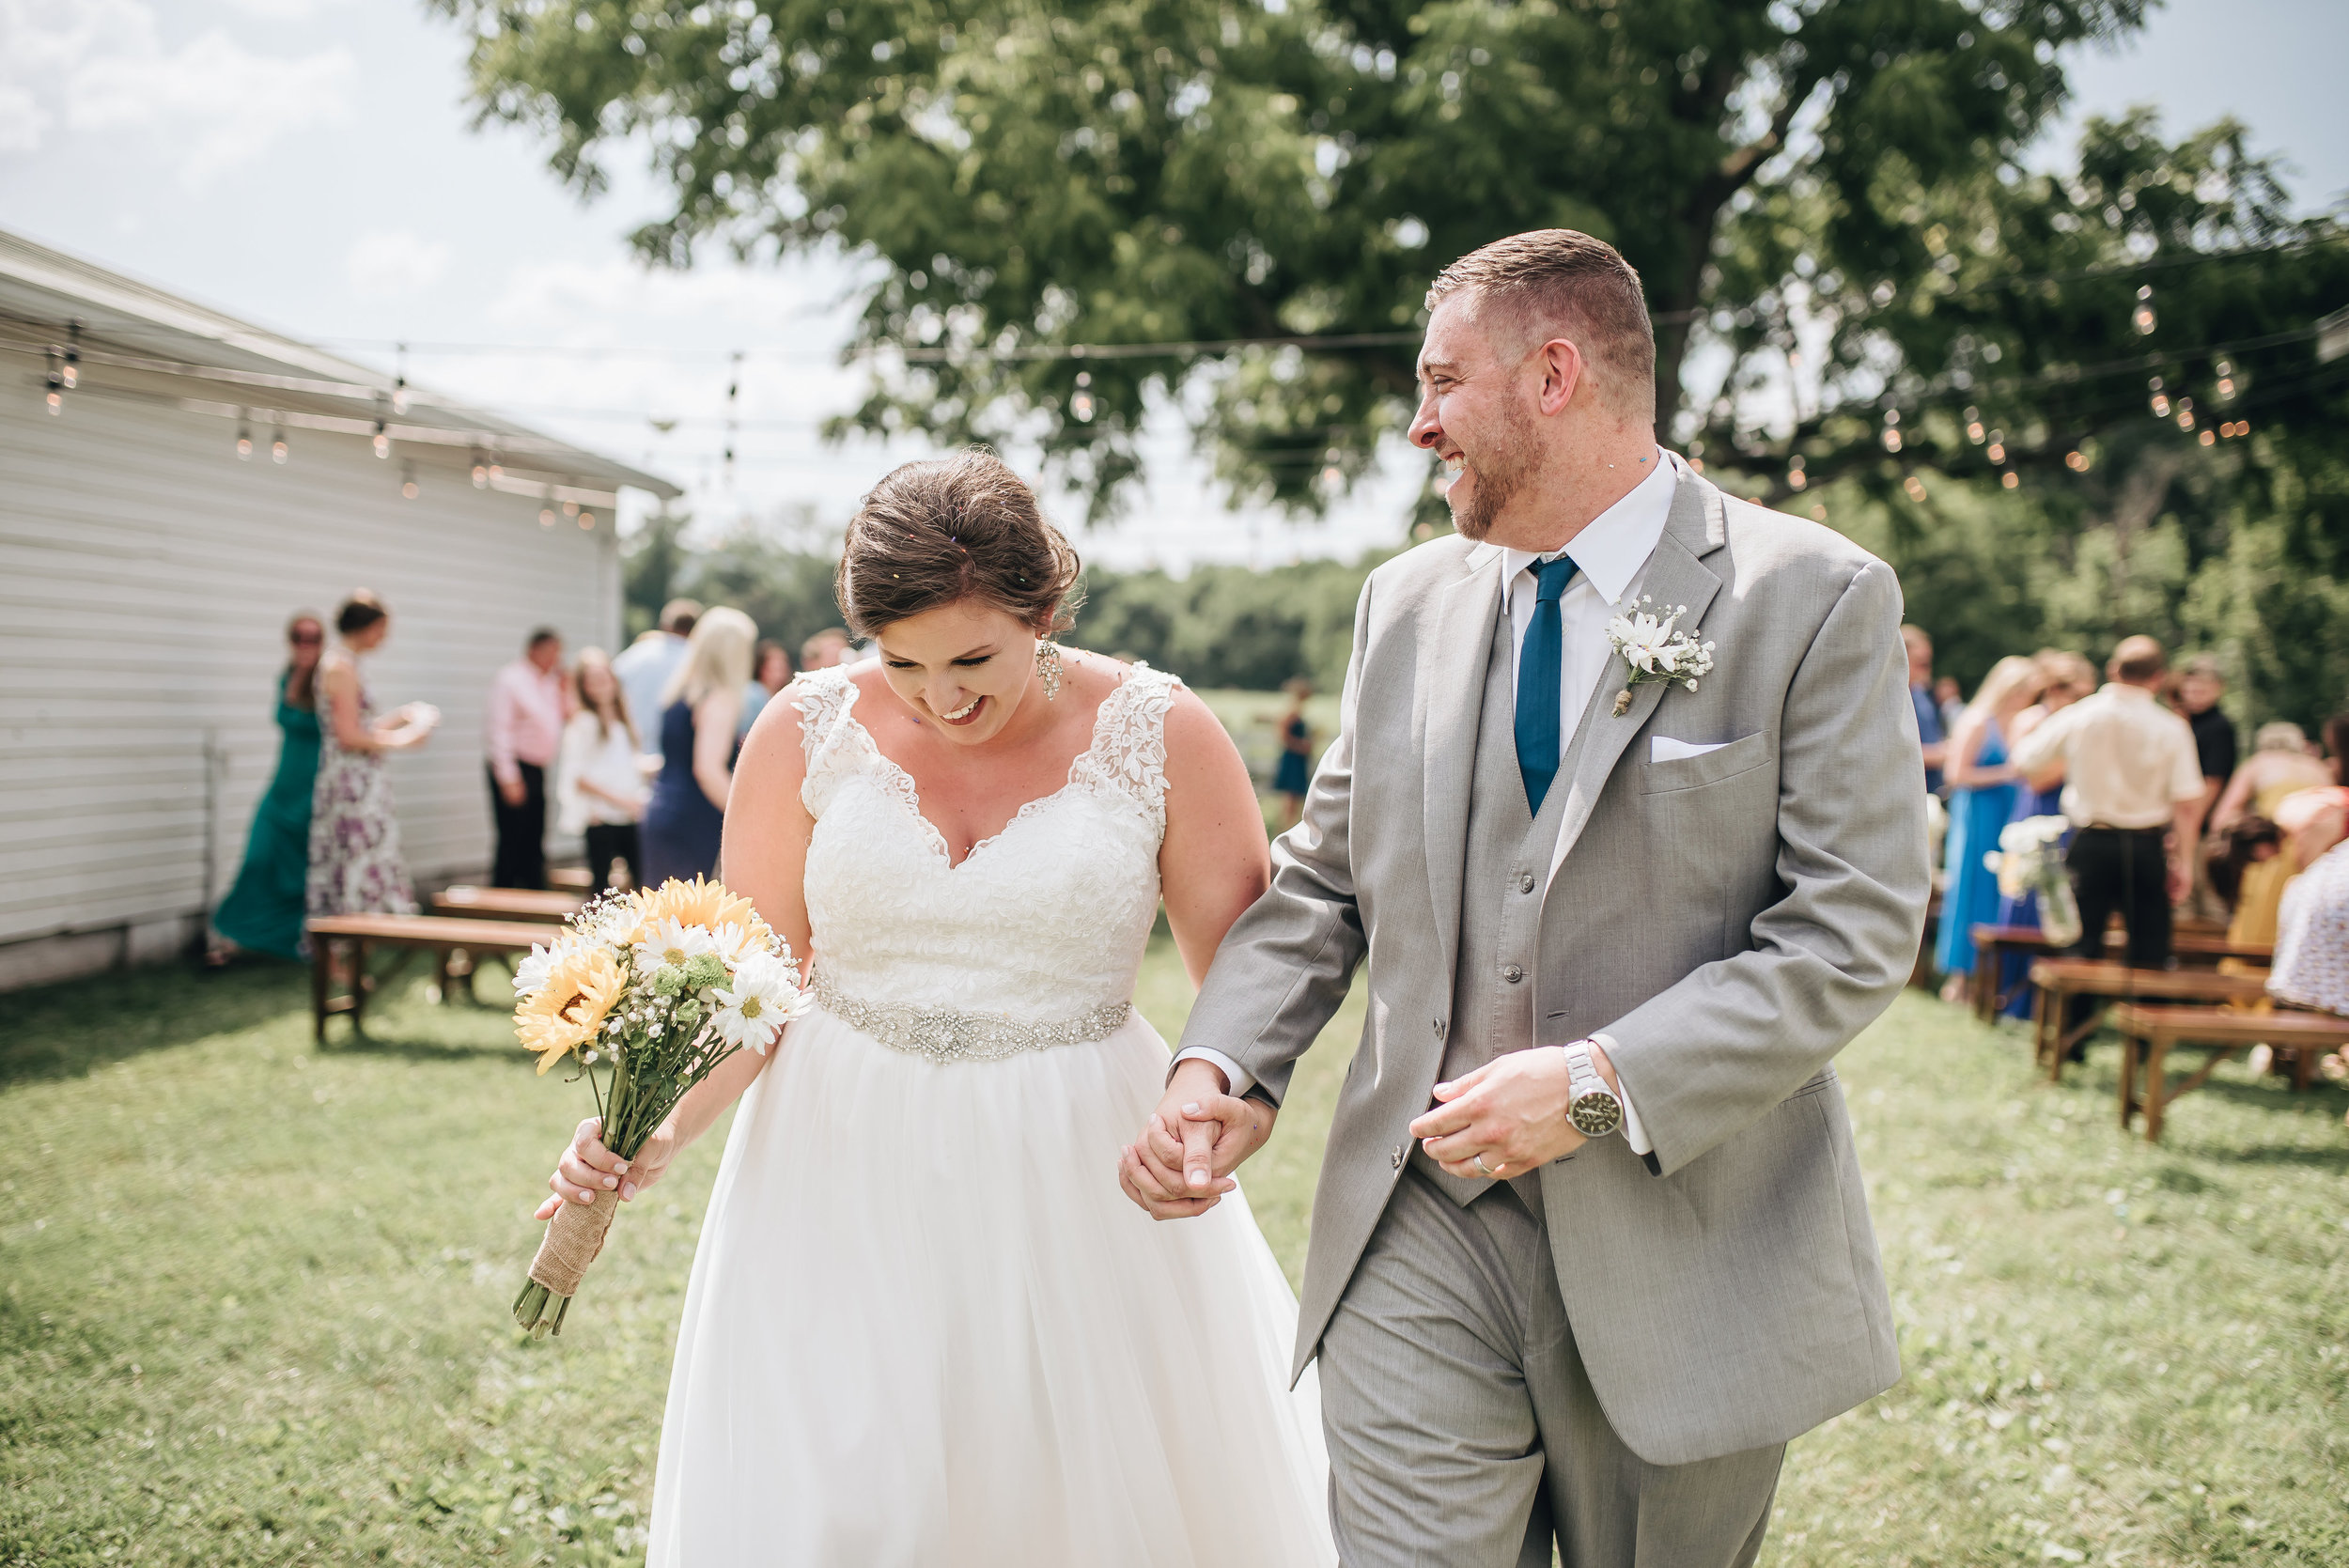 Cara and Shaun Wedding - EDITS-0230 - Copy.jpg